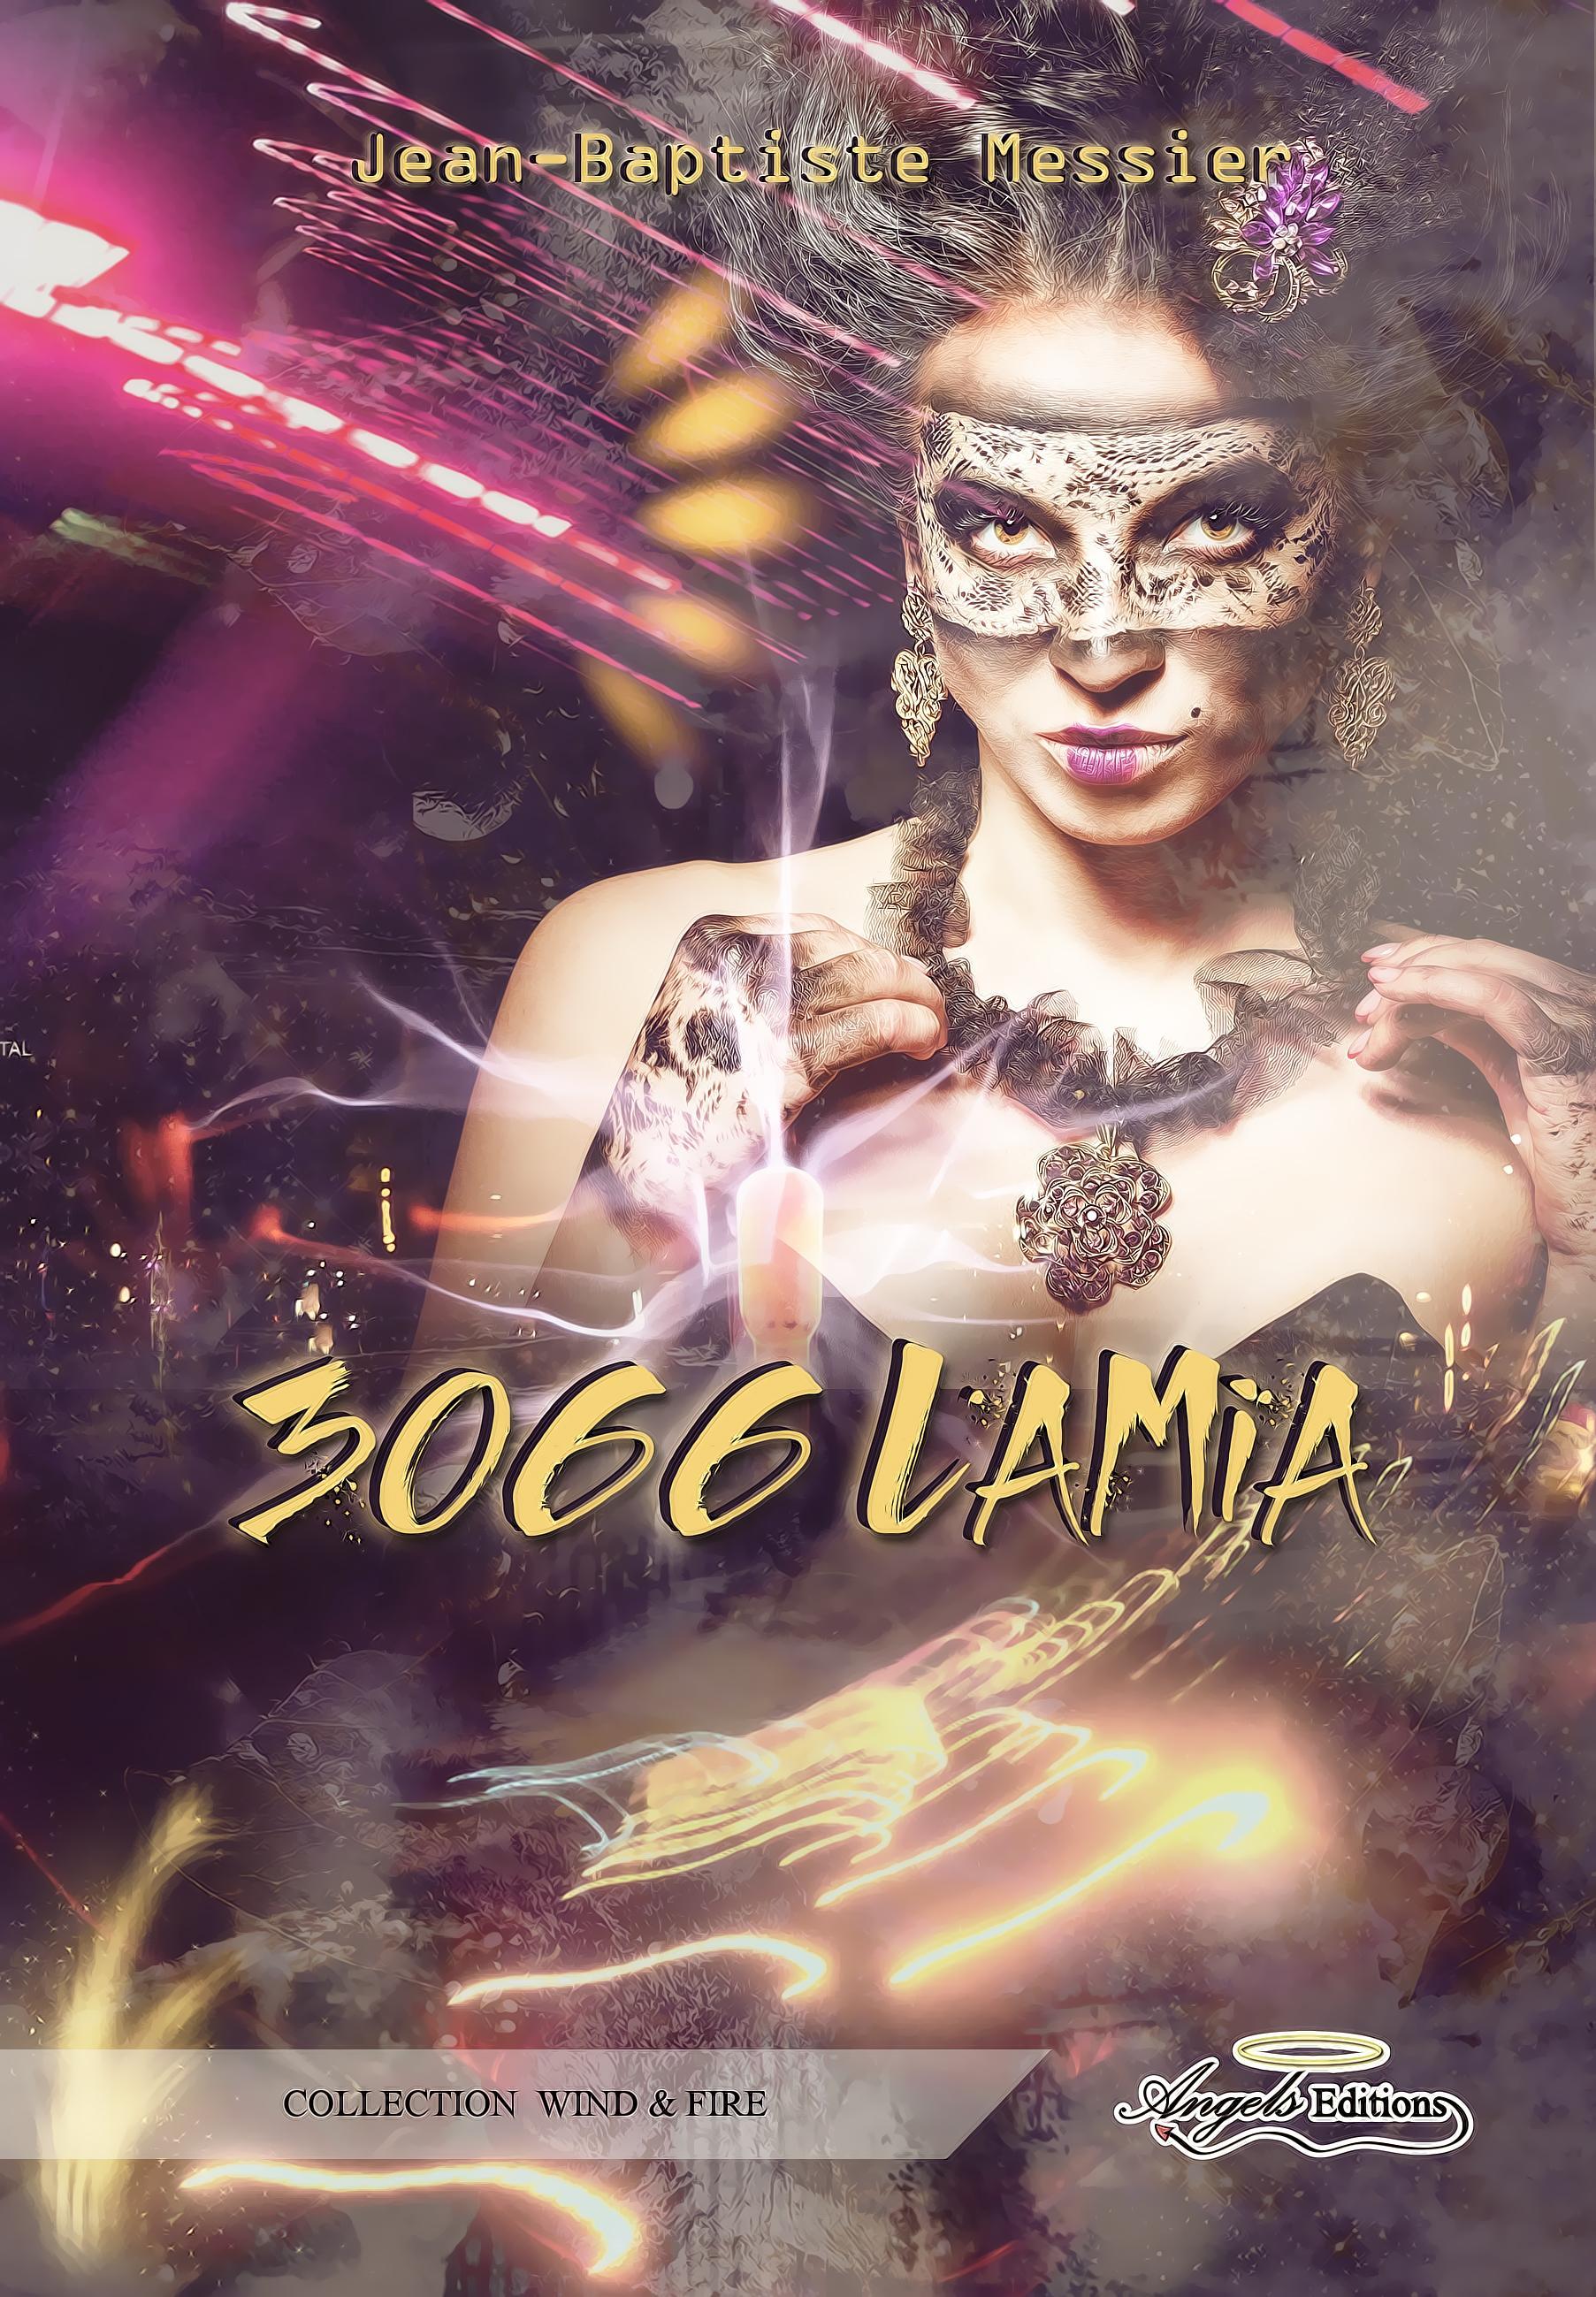 3066 Lamia